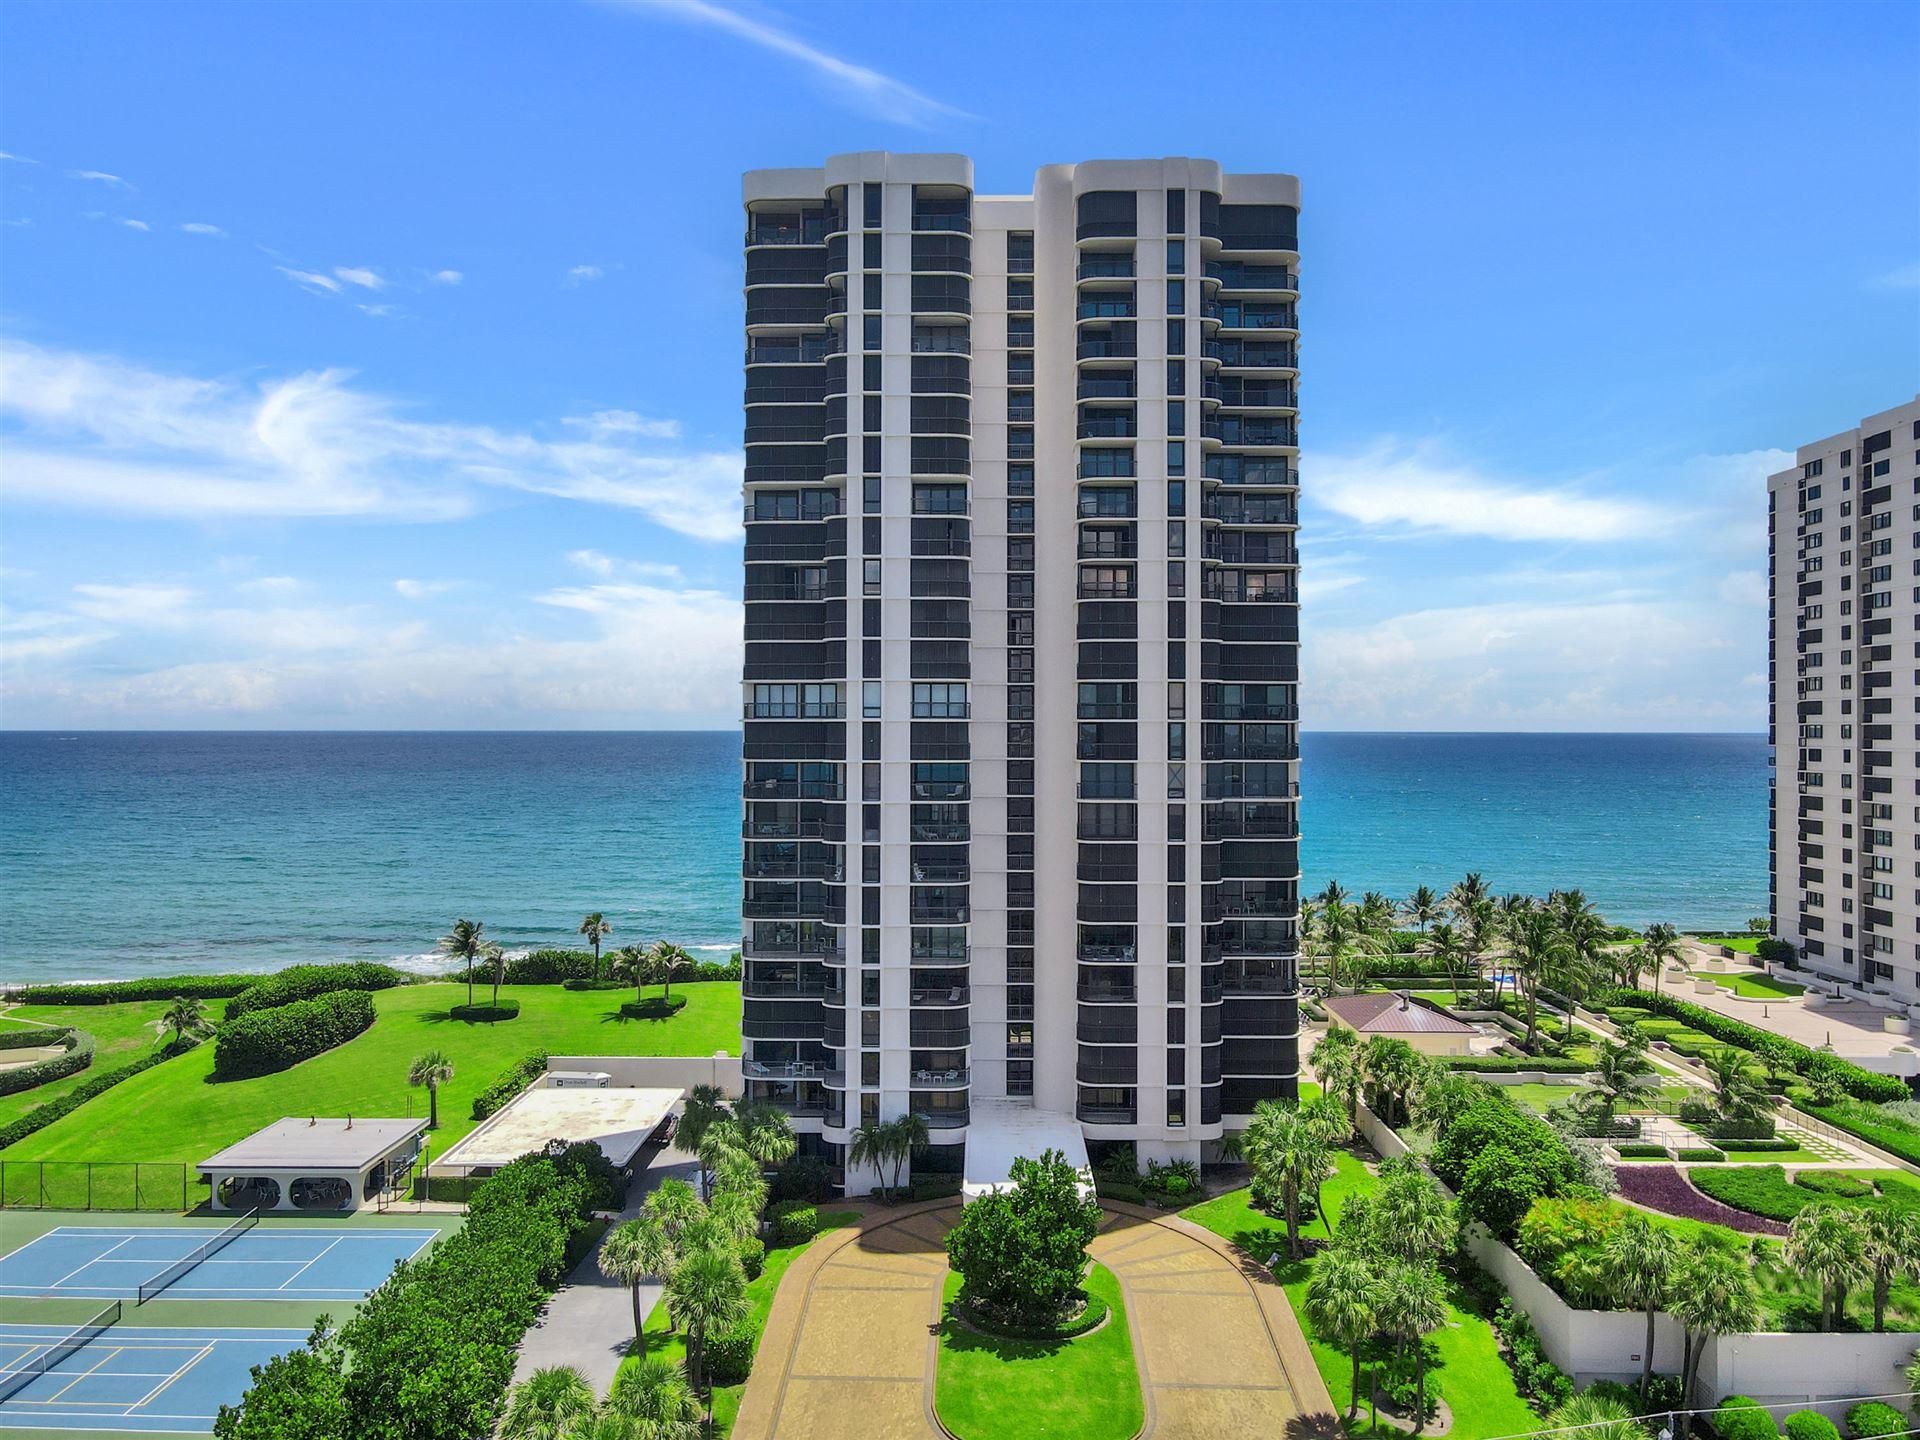 Photo for 5380 N Ocean Drive #16i, Singer Island, FL 33404 (MLS # RX-10738944)